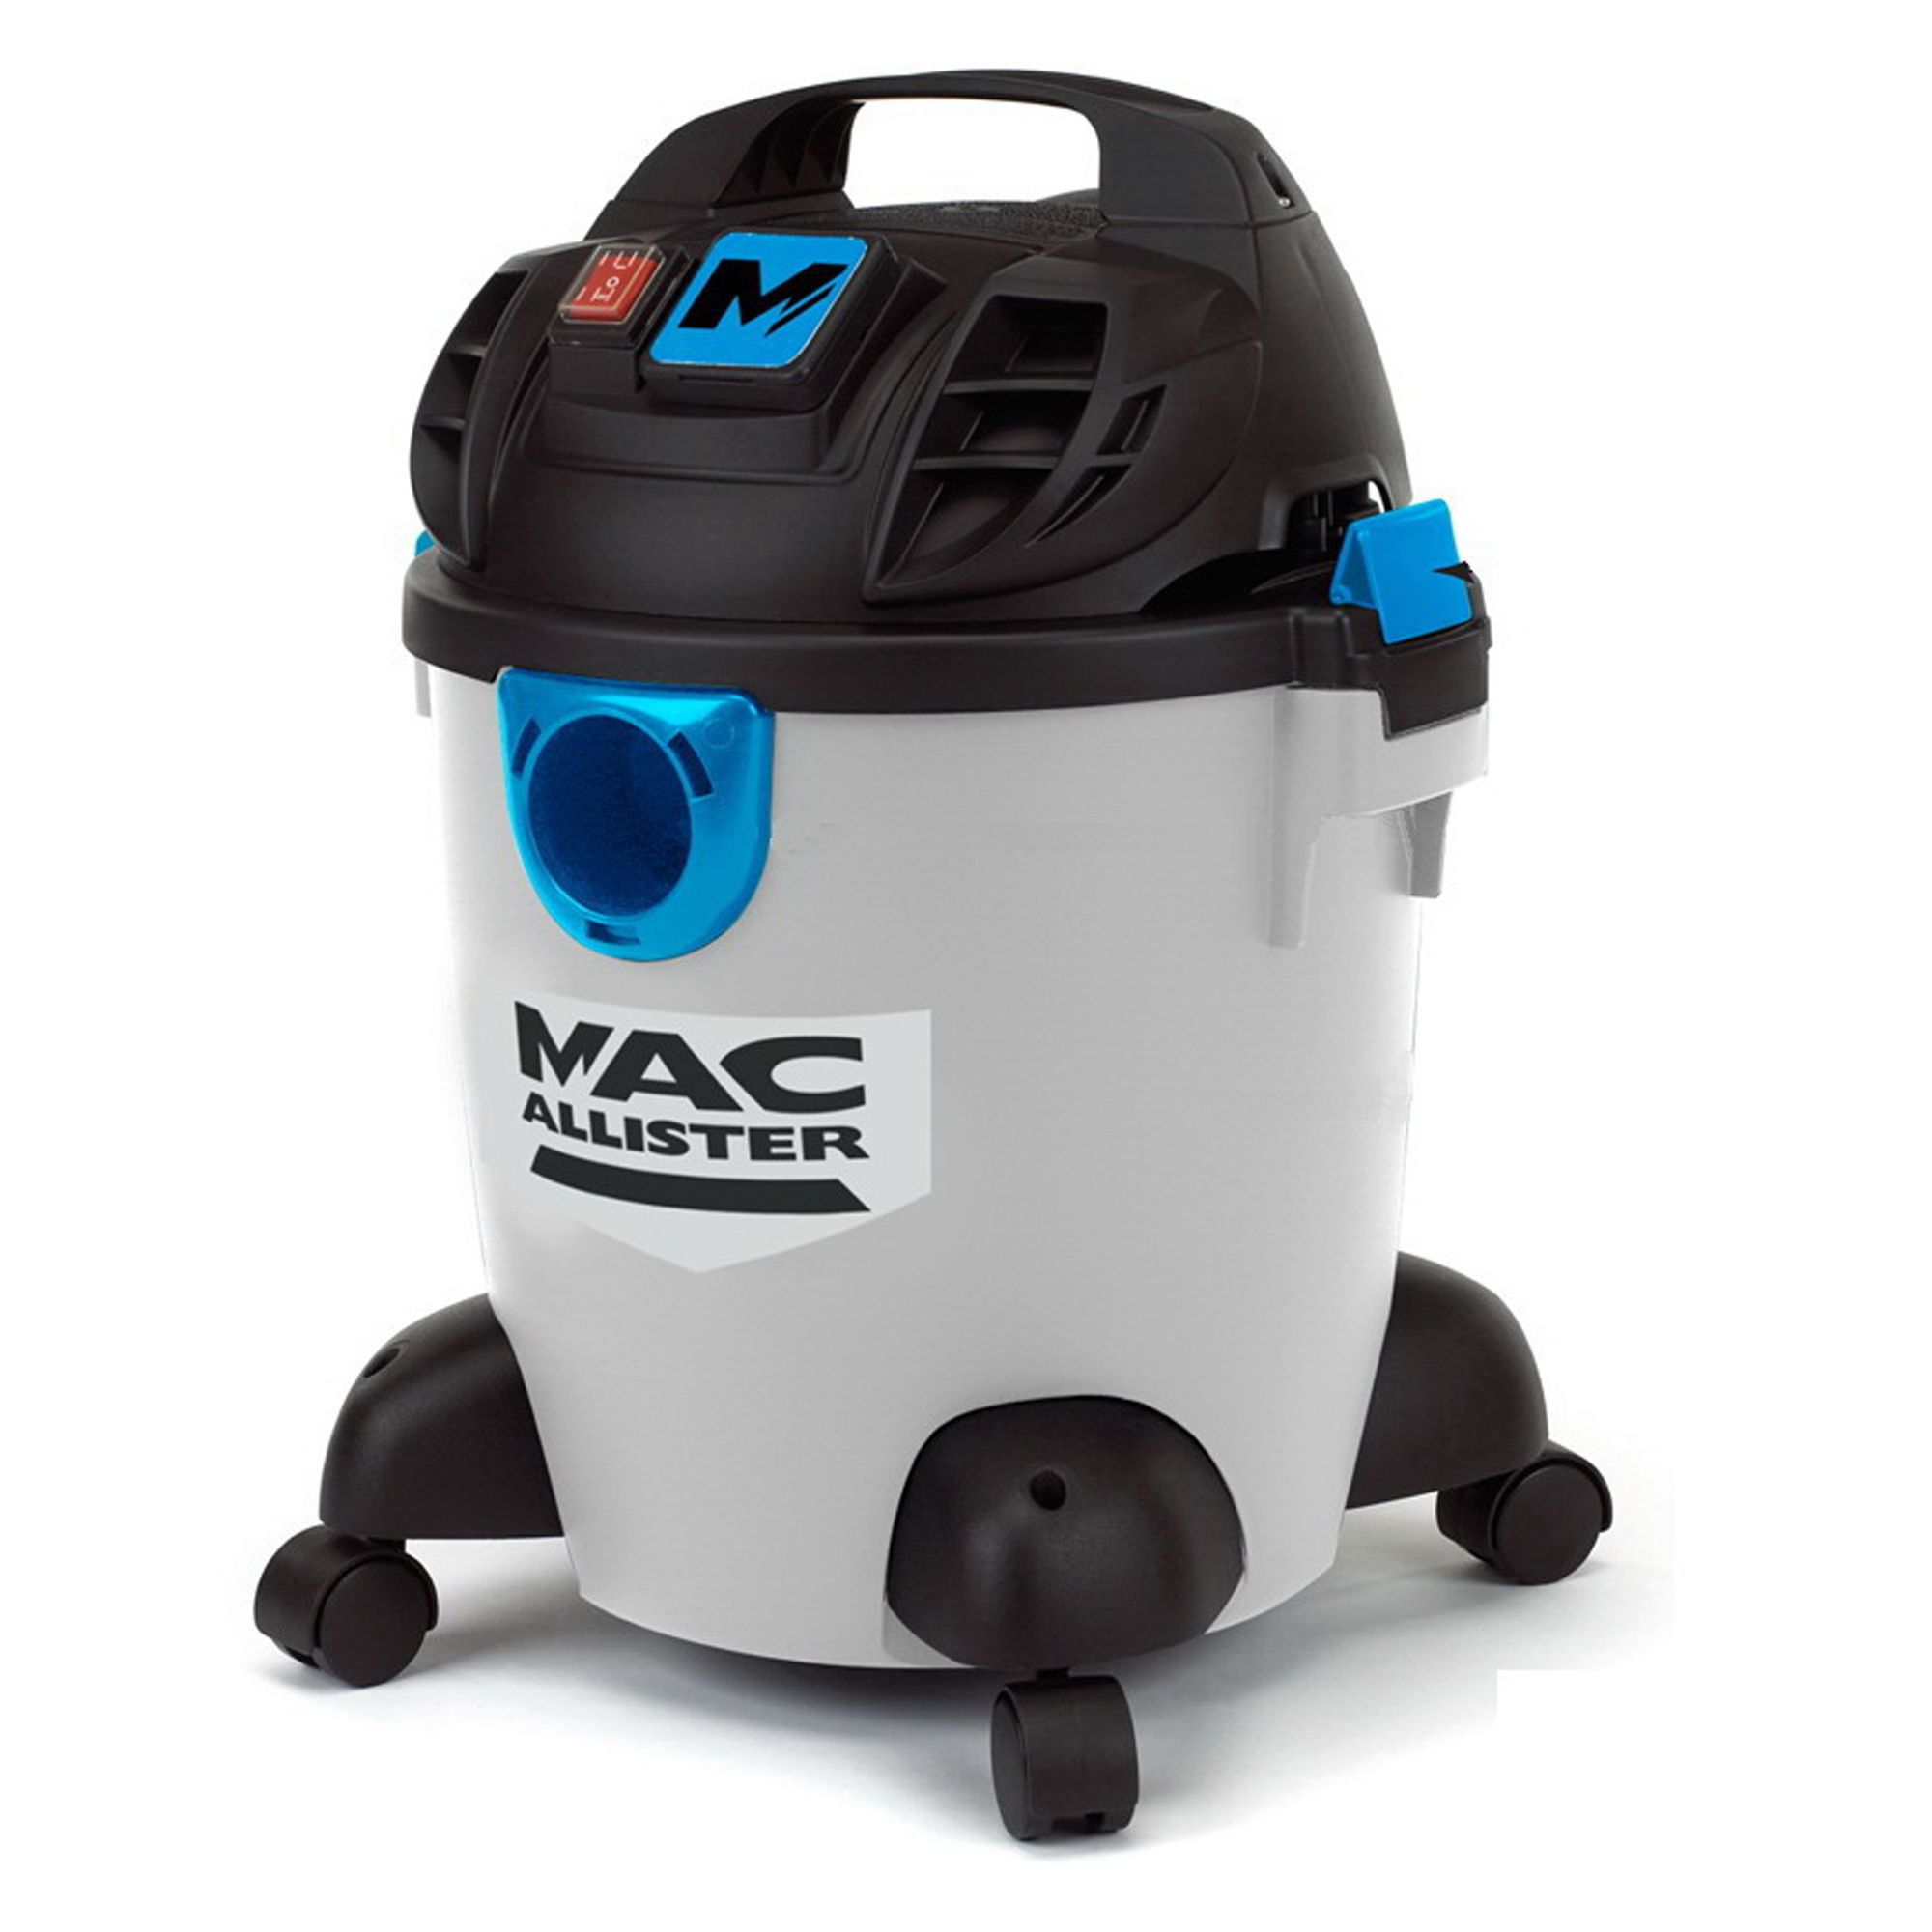 mac allister corded 16l bagged wet dry vacuum mwvpl16l departments diy at b q. Black Bedroom Furniture Sets. Home Design Ideas